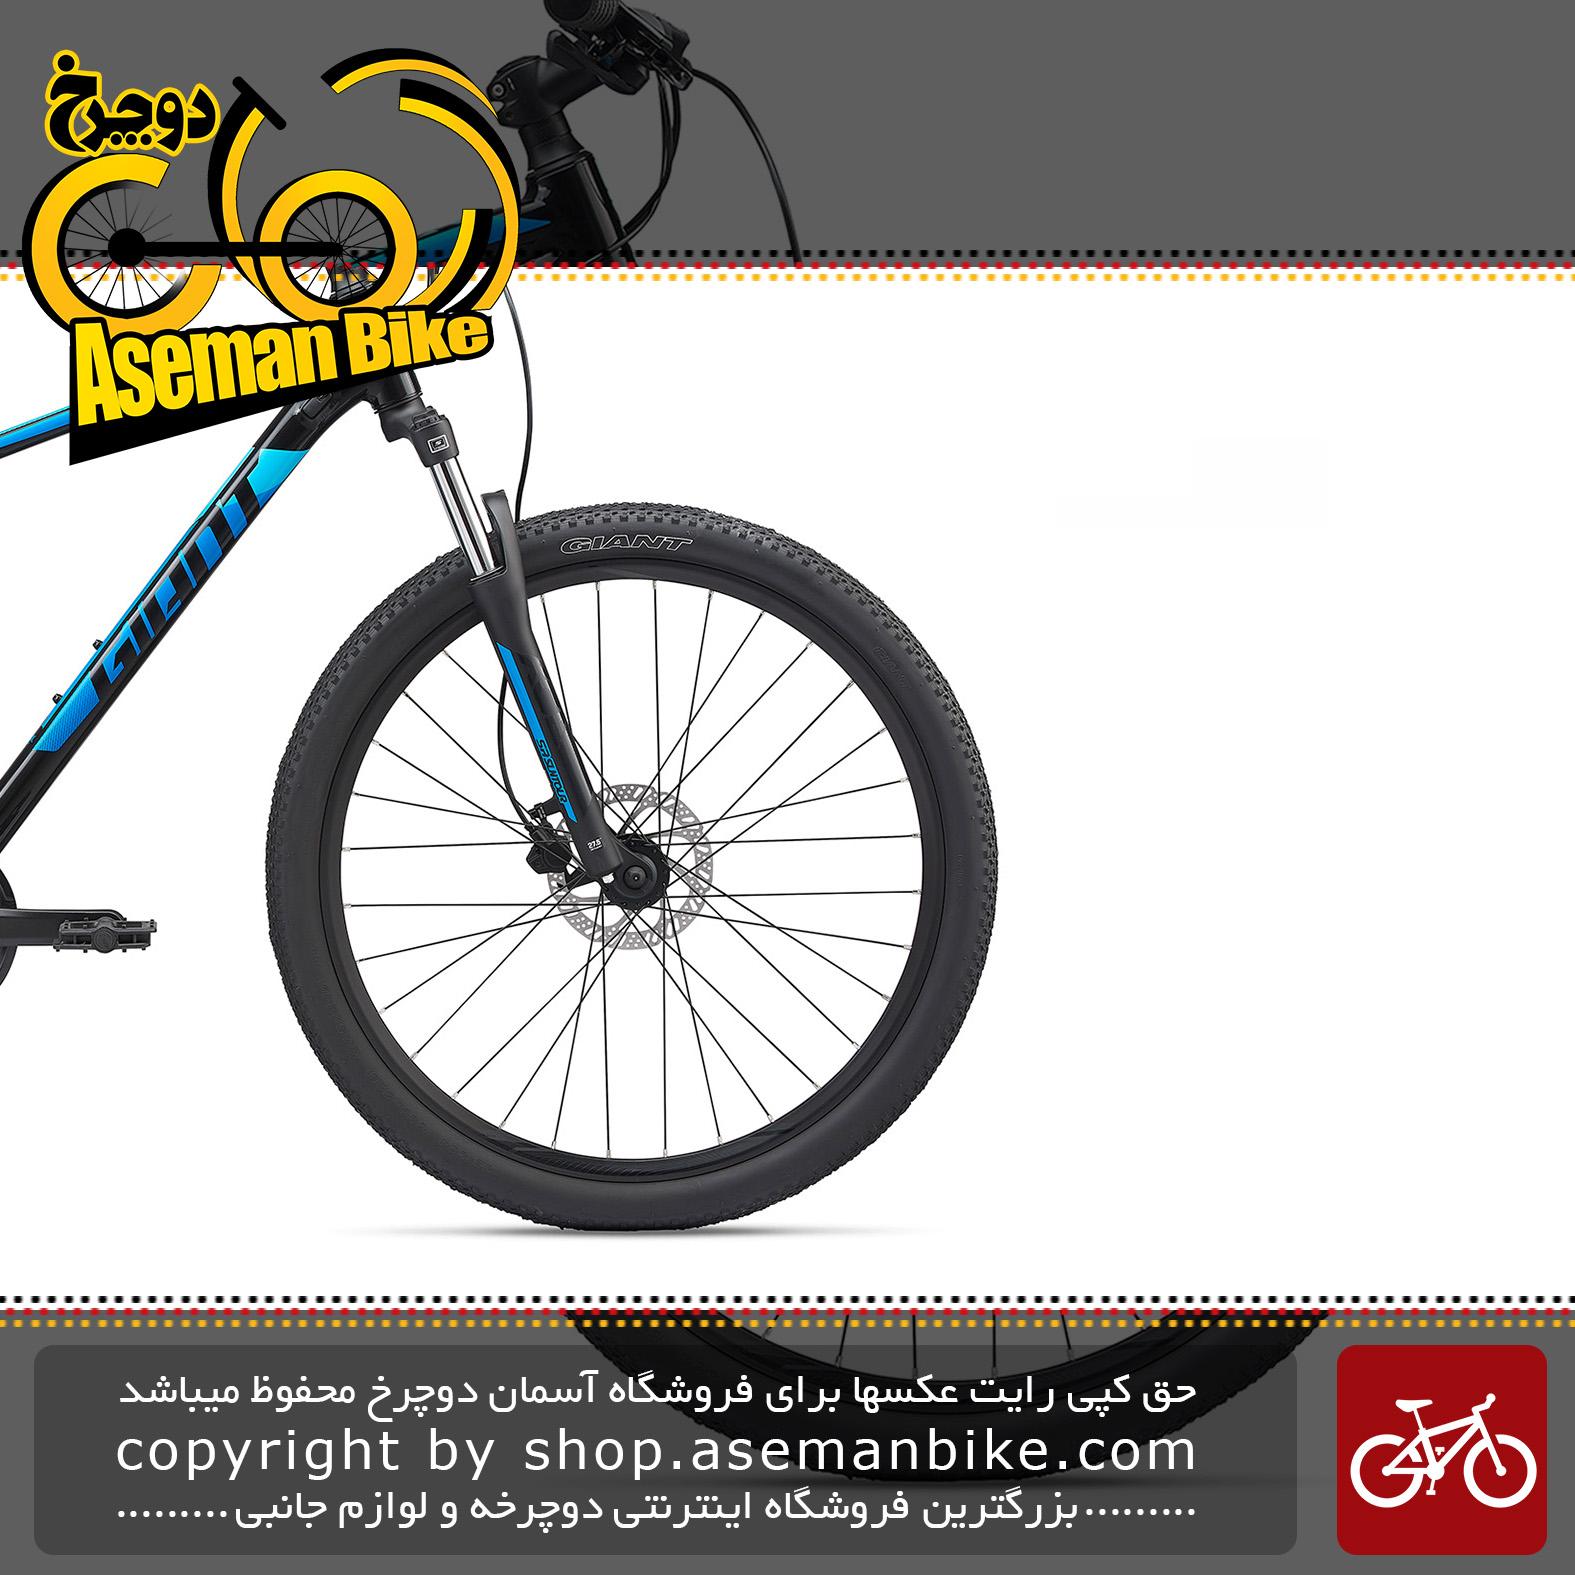 دوچرخه کوهستان جاینت مدل ای تی ایکس 2 (جی ای) 2020 Giant Mountain Bicycle ATX 2 (GE) 2020